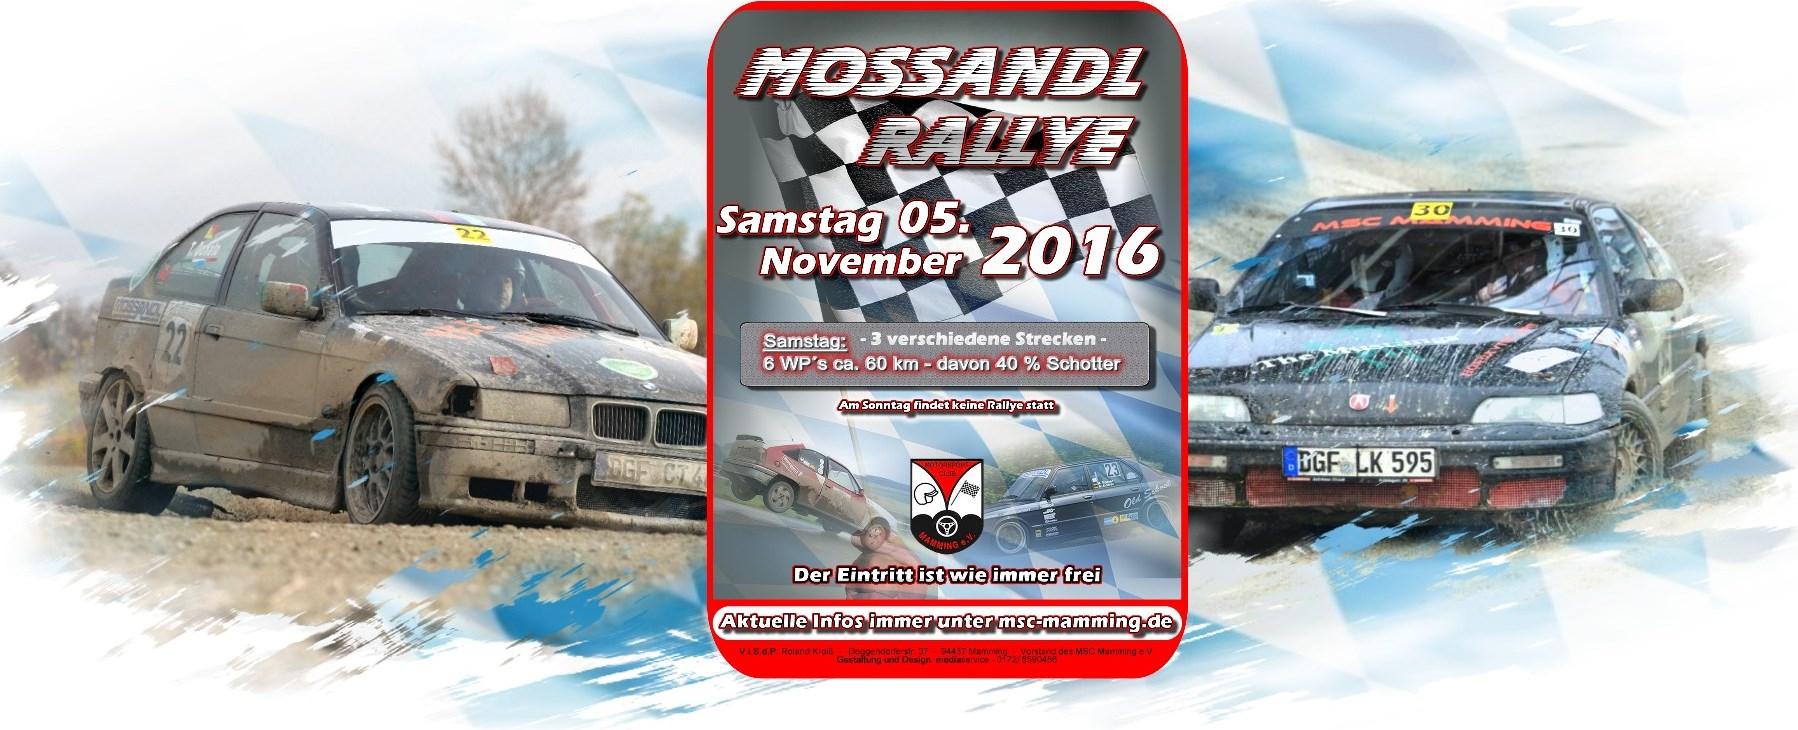 Mossandl-Rallye 2016